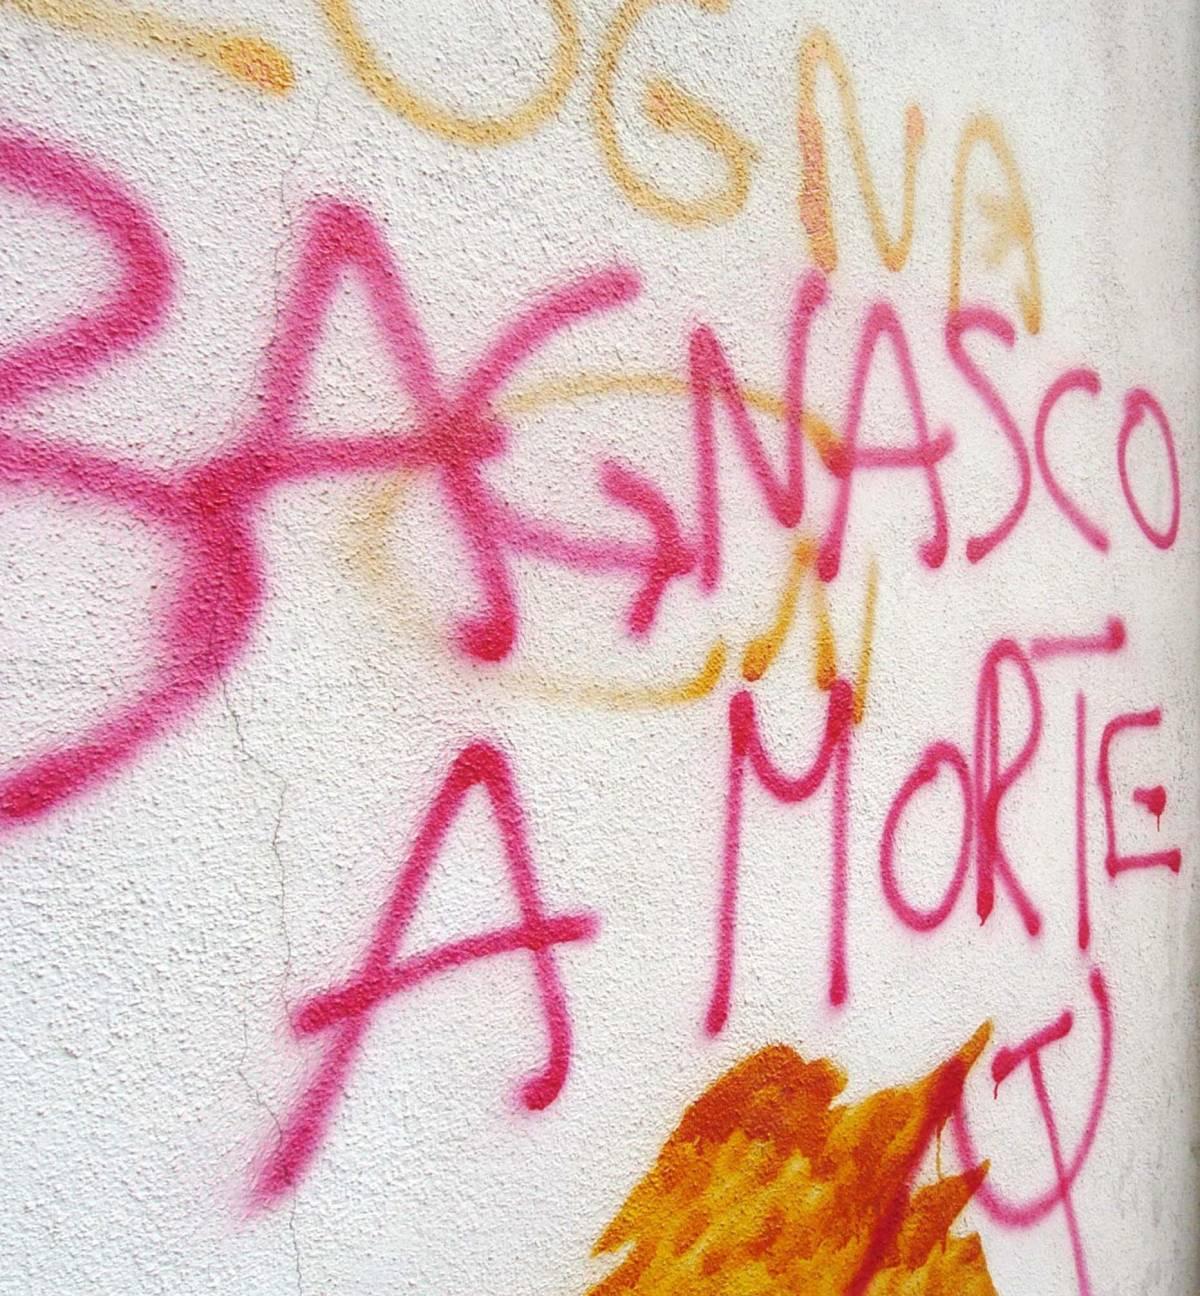 Marta Vincenzi e le offese a Bagnasco